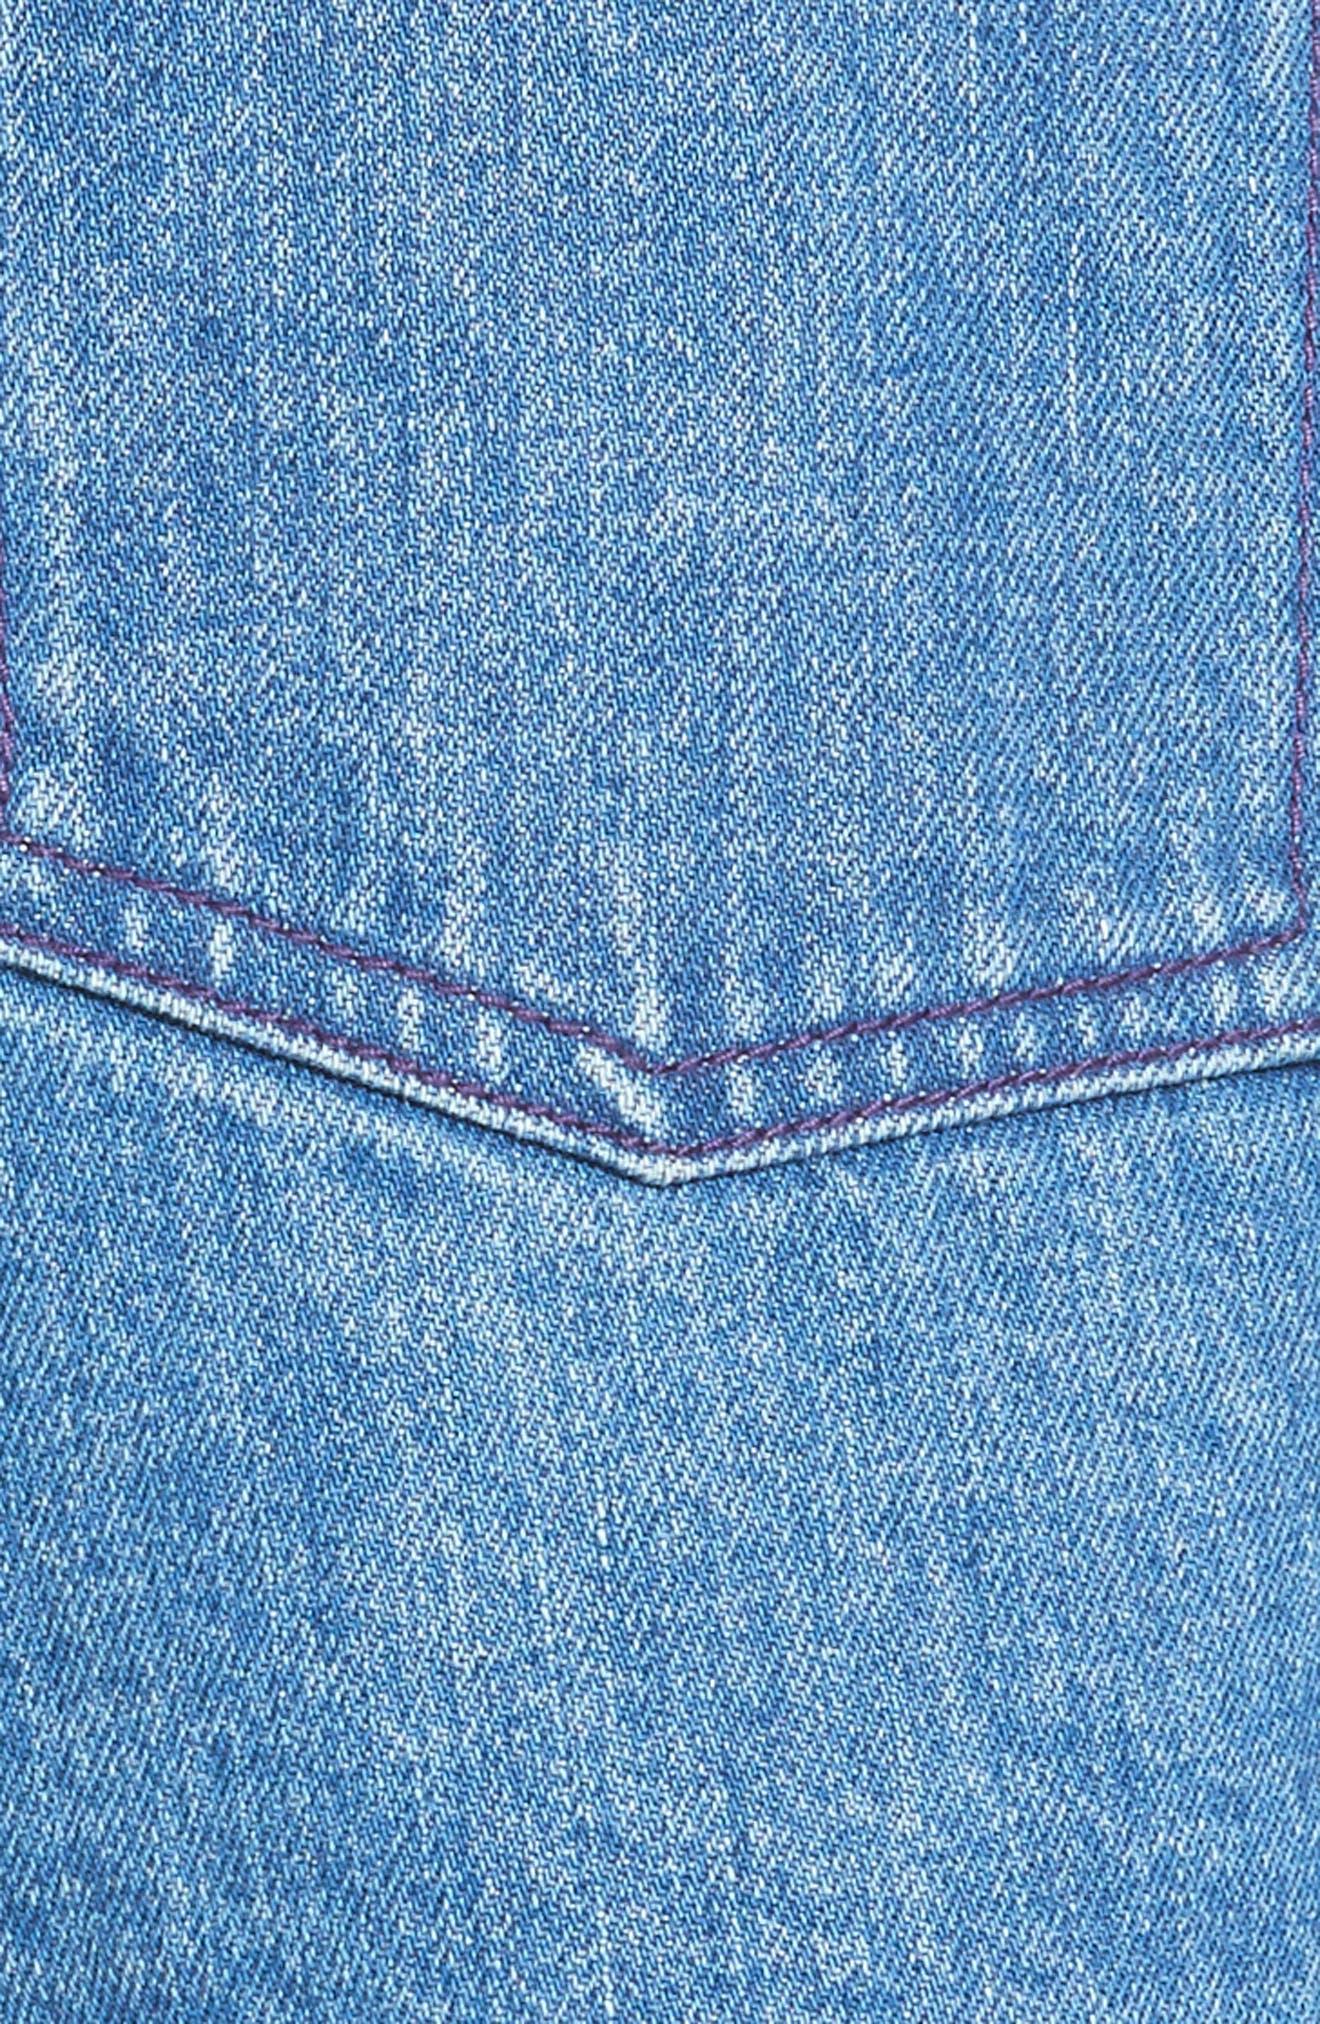 Inside Out Denim Shorts,                             Alternate thumbnail 5, color,                             420